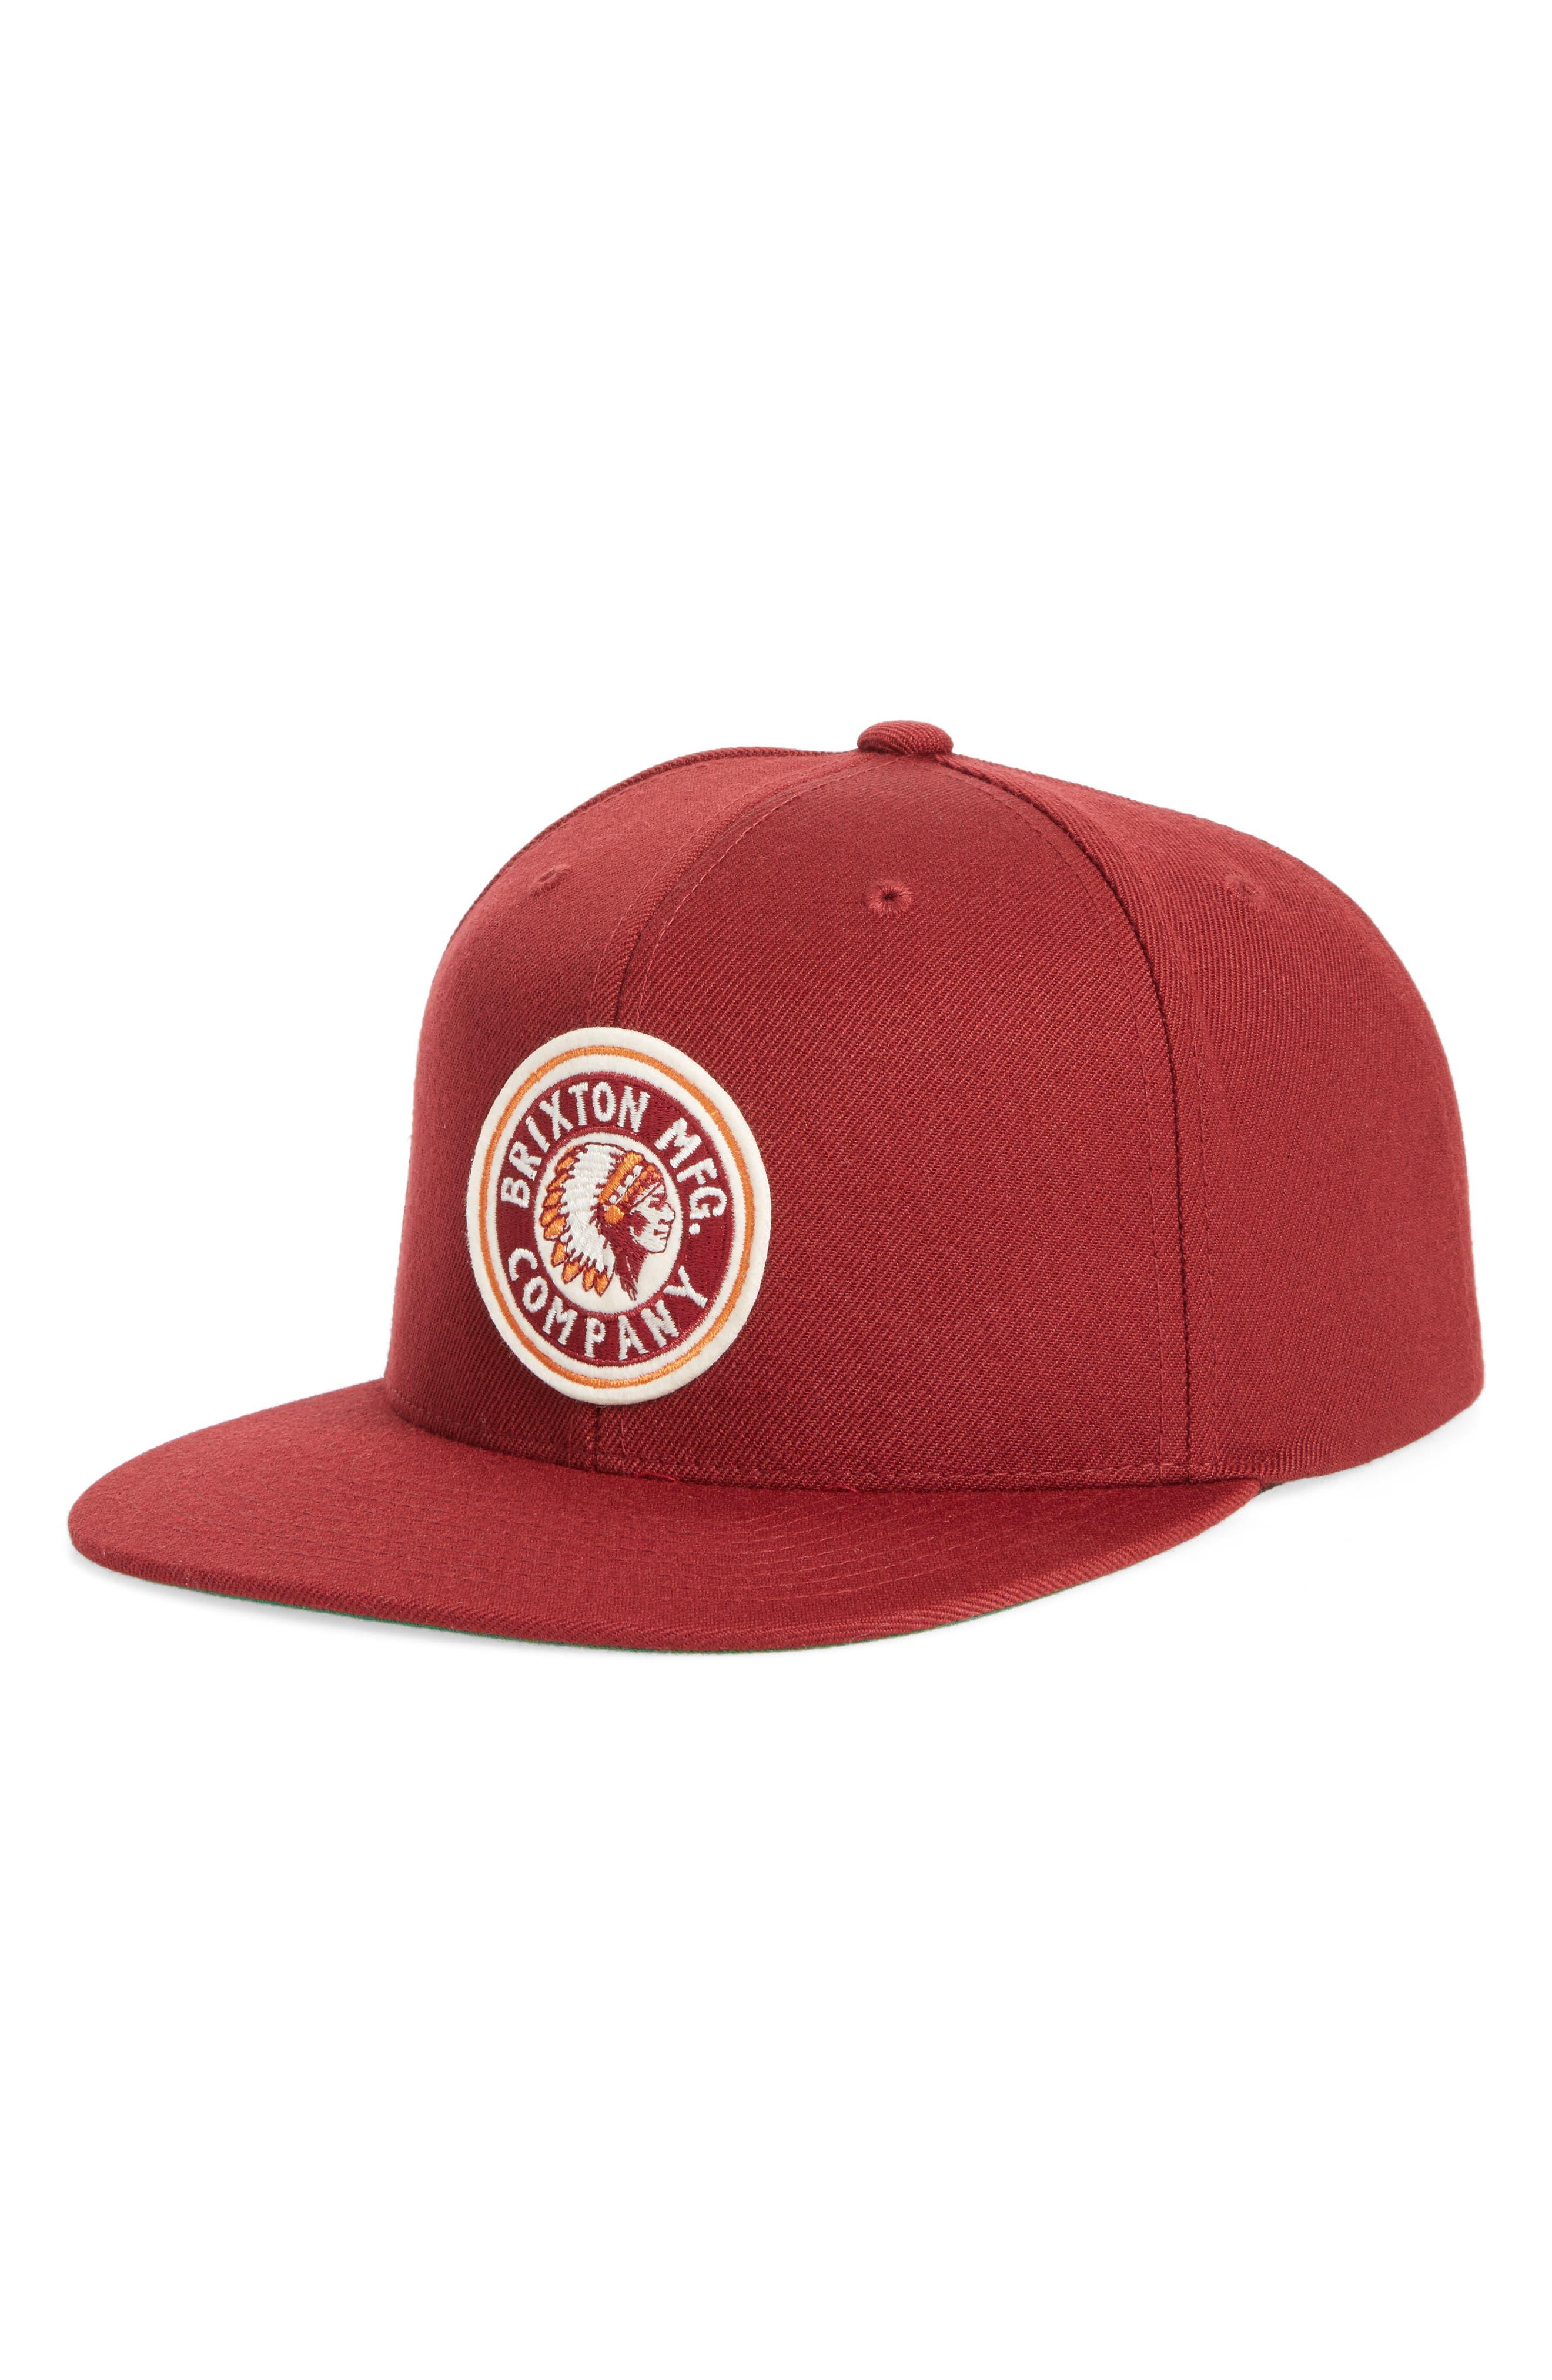 Alternate Image 1 Selected - Brixton 'Rival' Snapback Baseball Cap